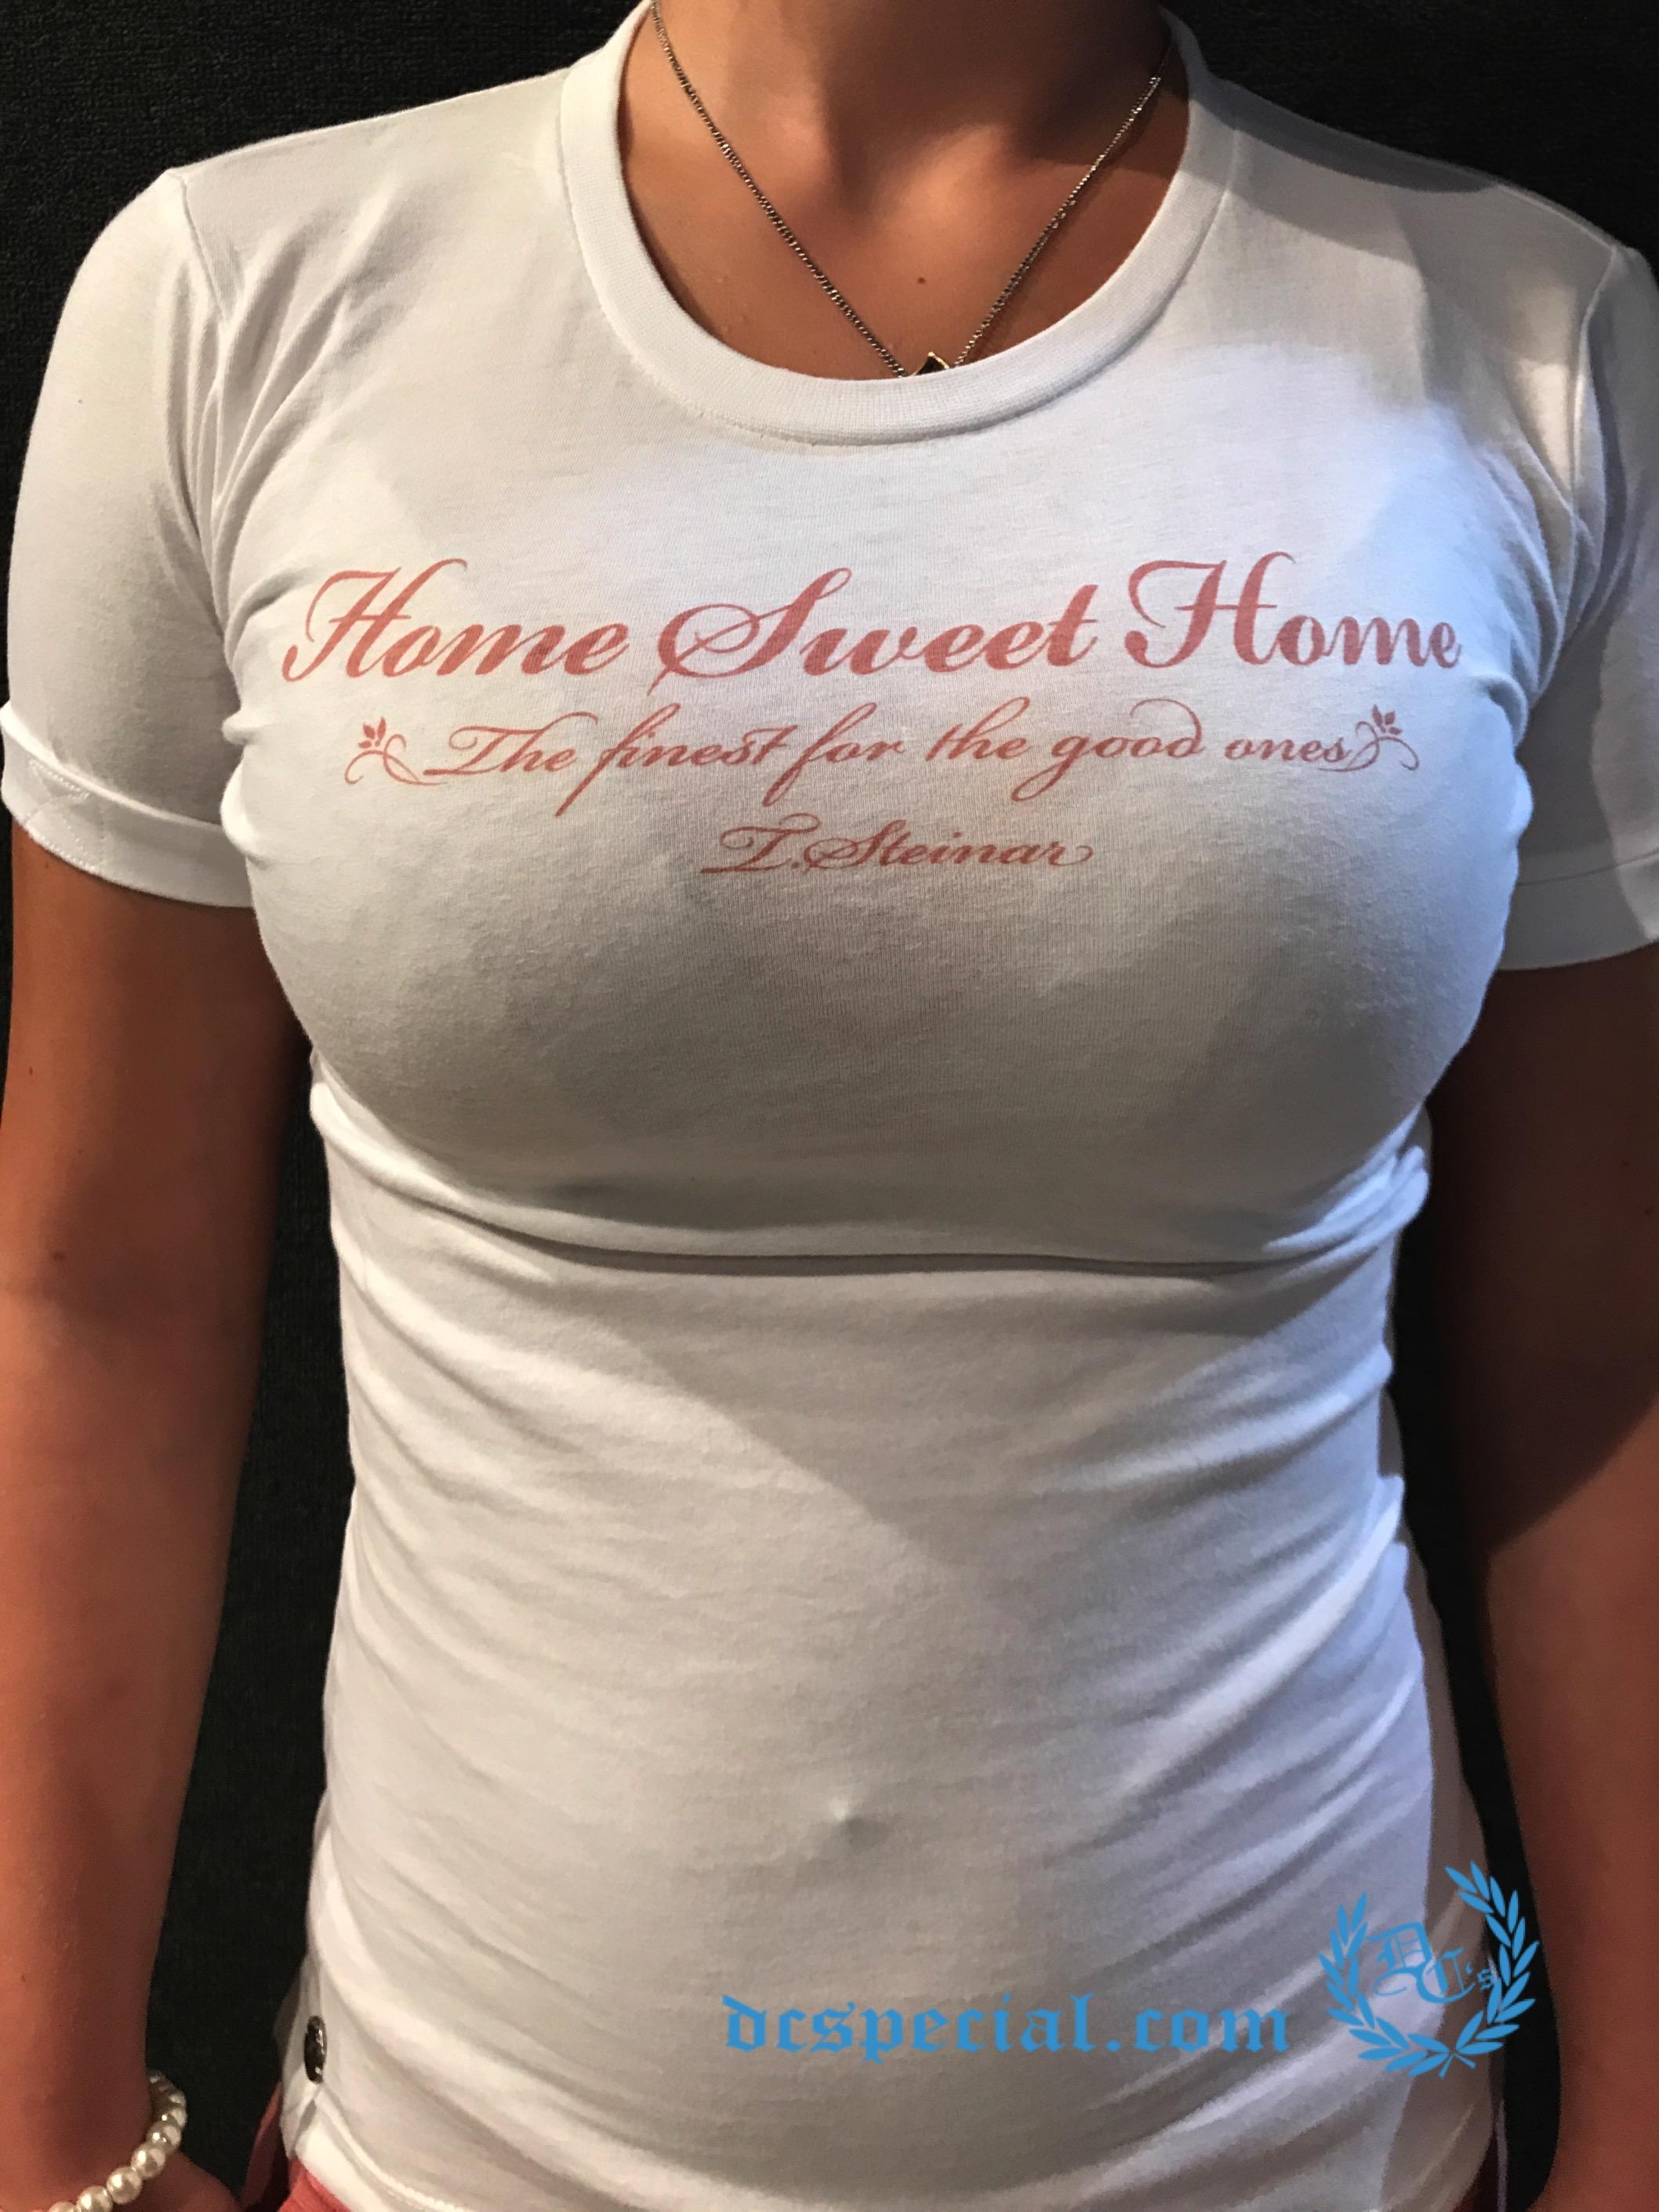 Thor Steinar Pyama 'Home Sweet Home'